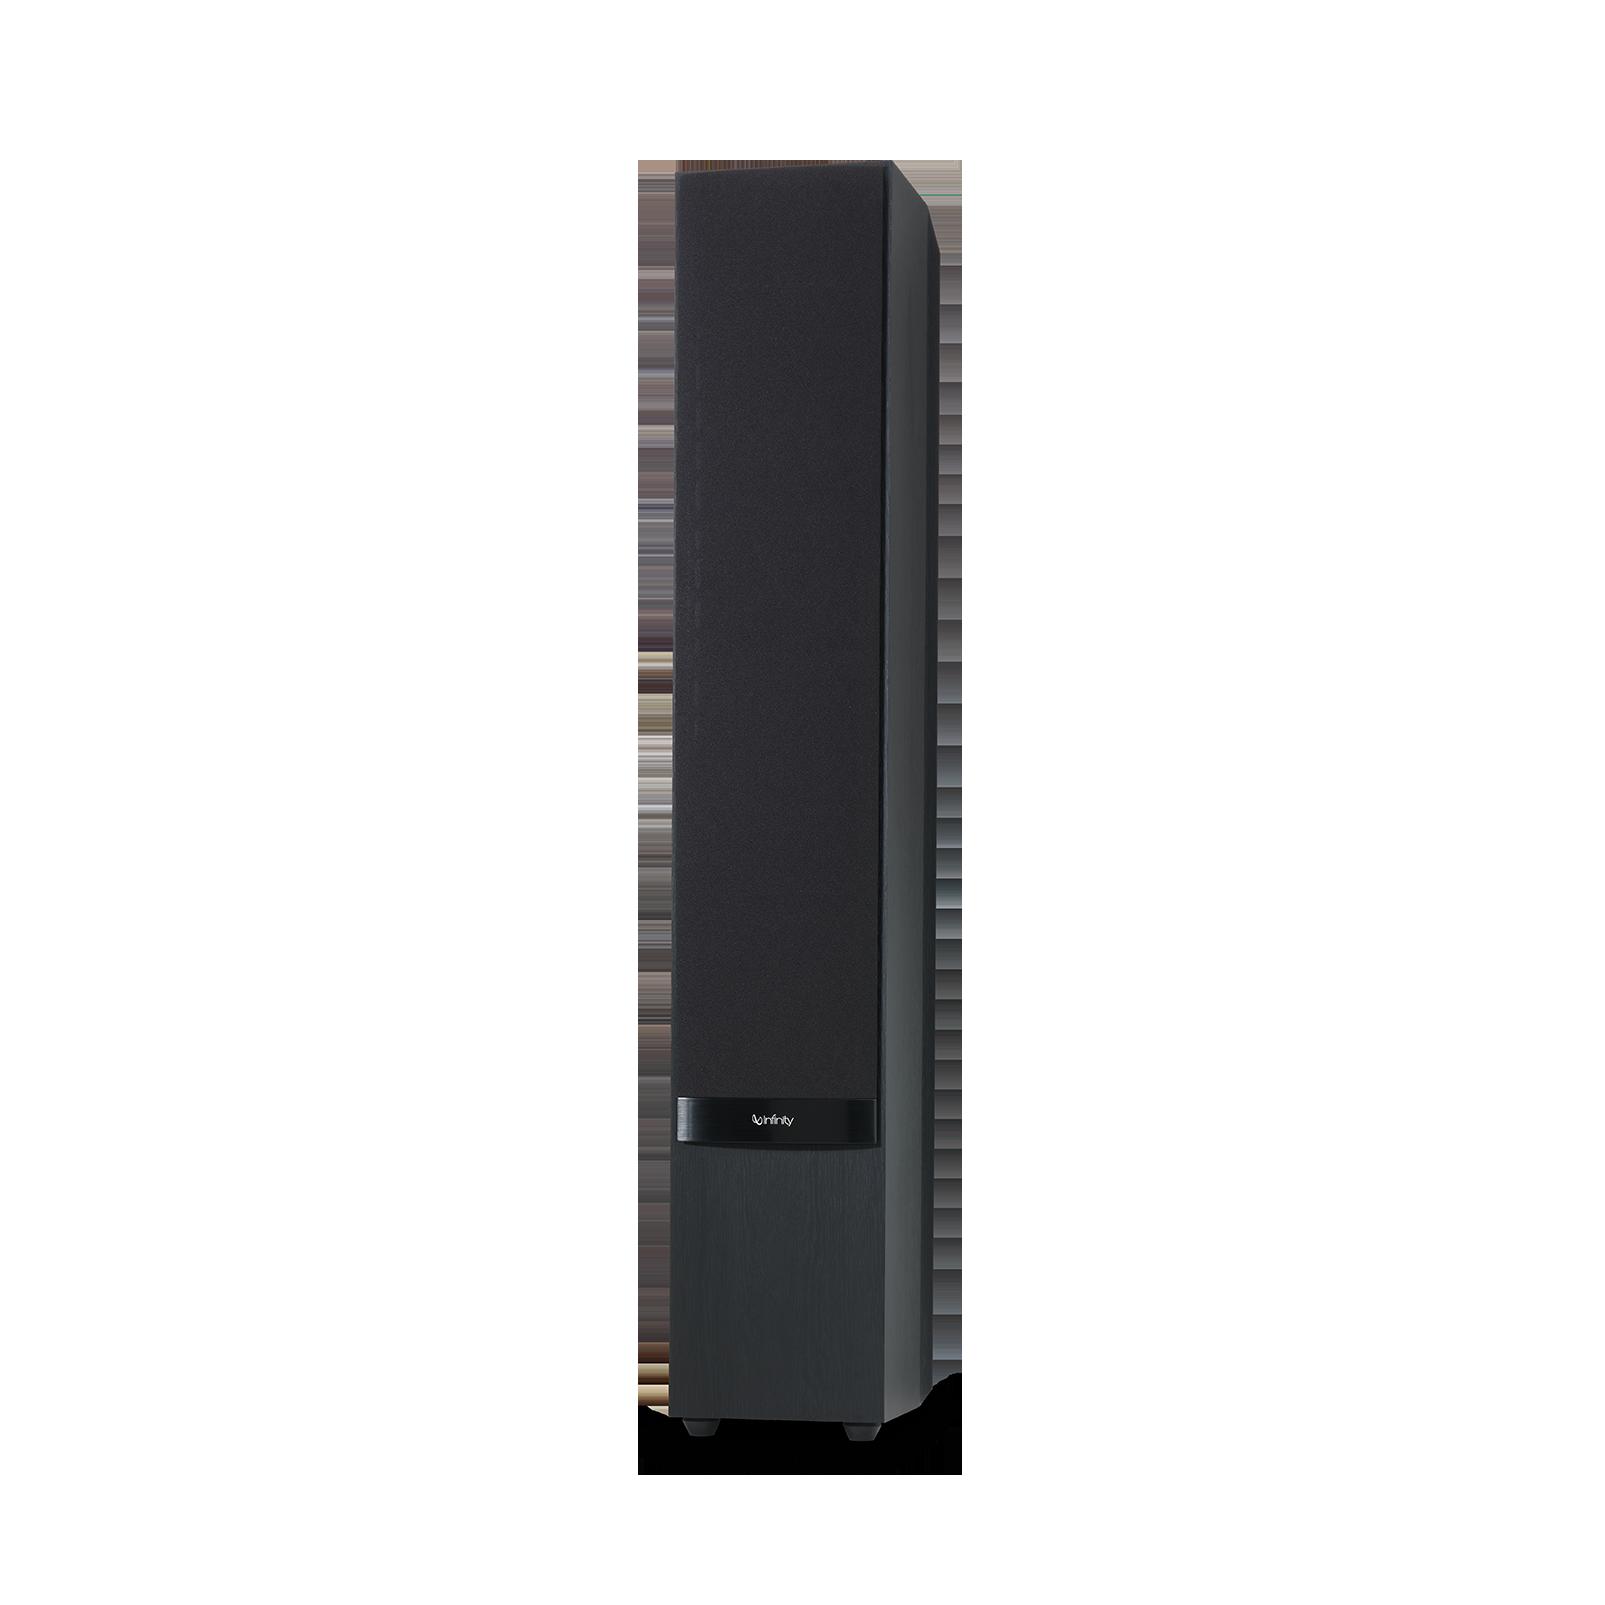 "Reference 263 - Black - 6-1/2"" 3-Way Floorstanding Loudspeaker - Detailshot 3"